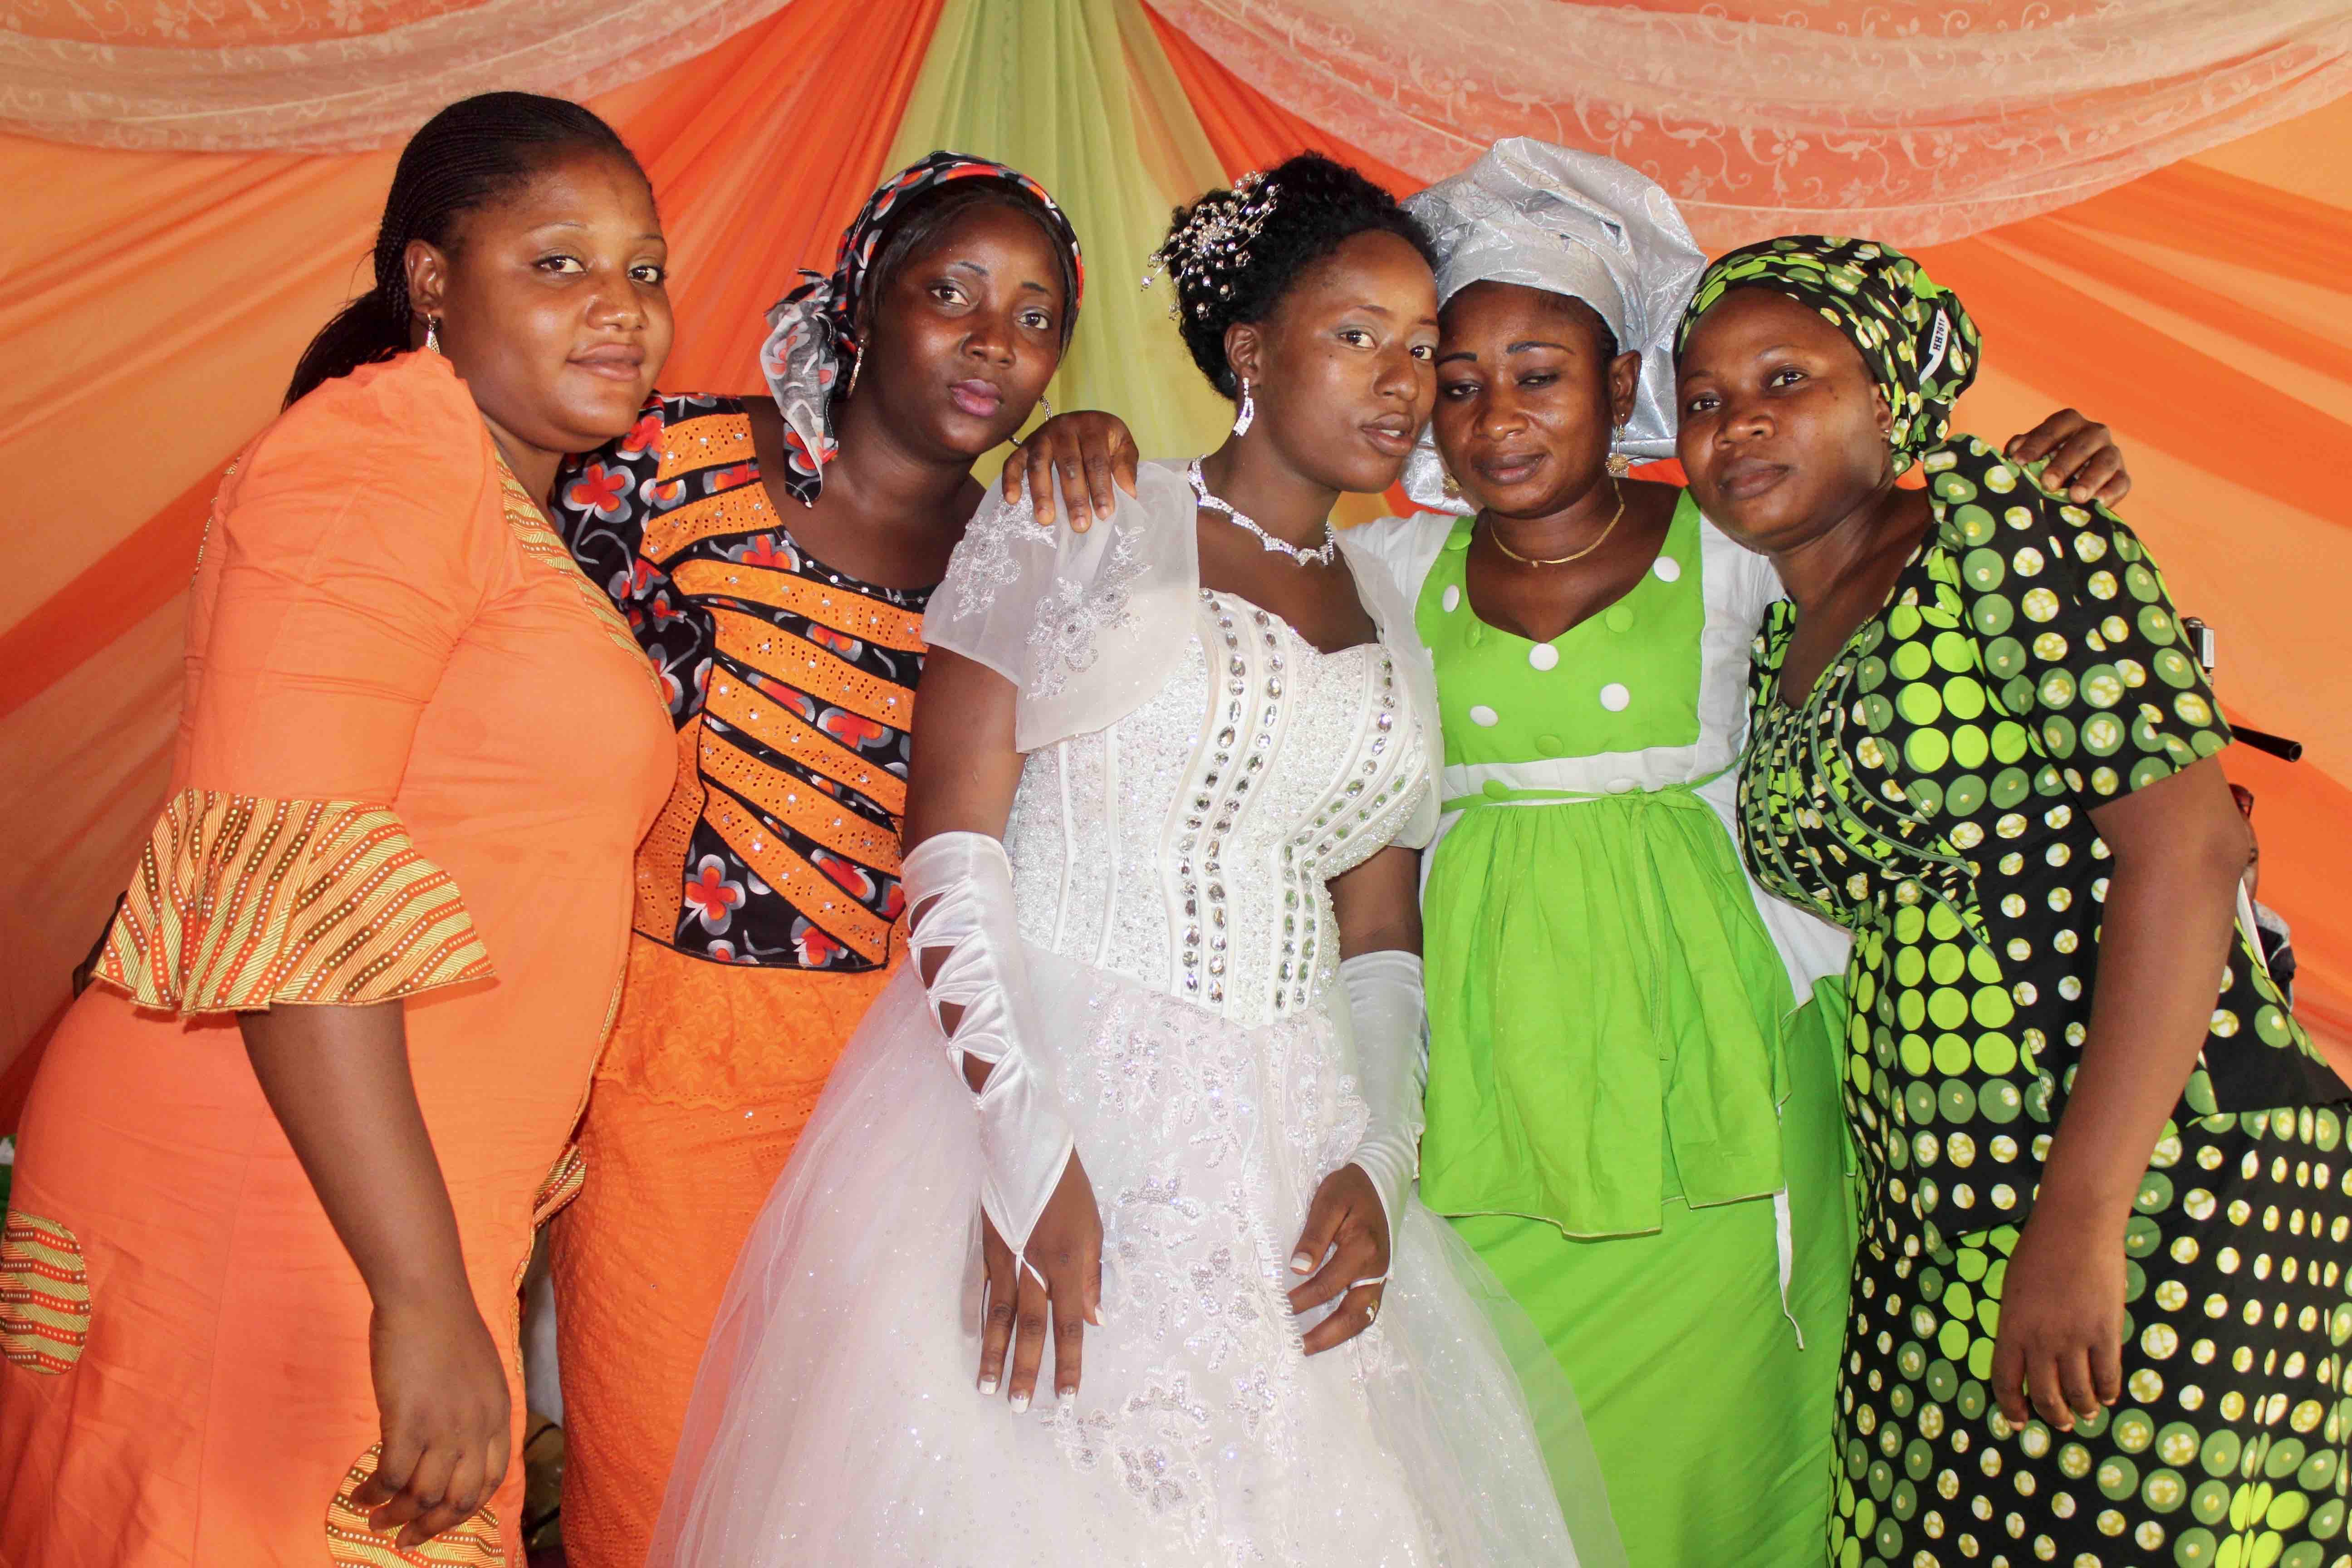 Nigerian wedding, bride is from Jigo, Bwari LGA and bridegroom is from Lendere, Wamba LGA Nasarawa State Nigeria. #JujuFilms